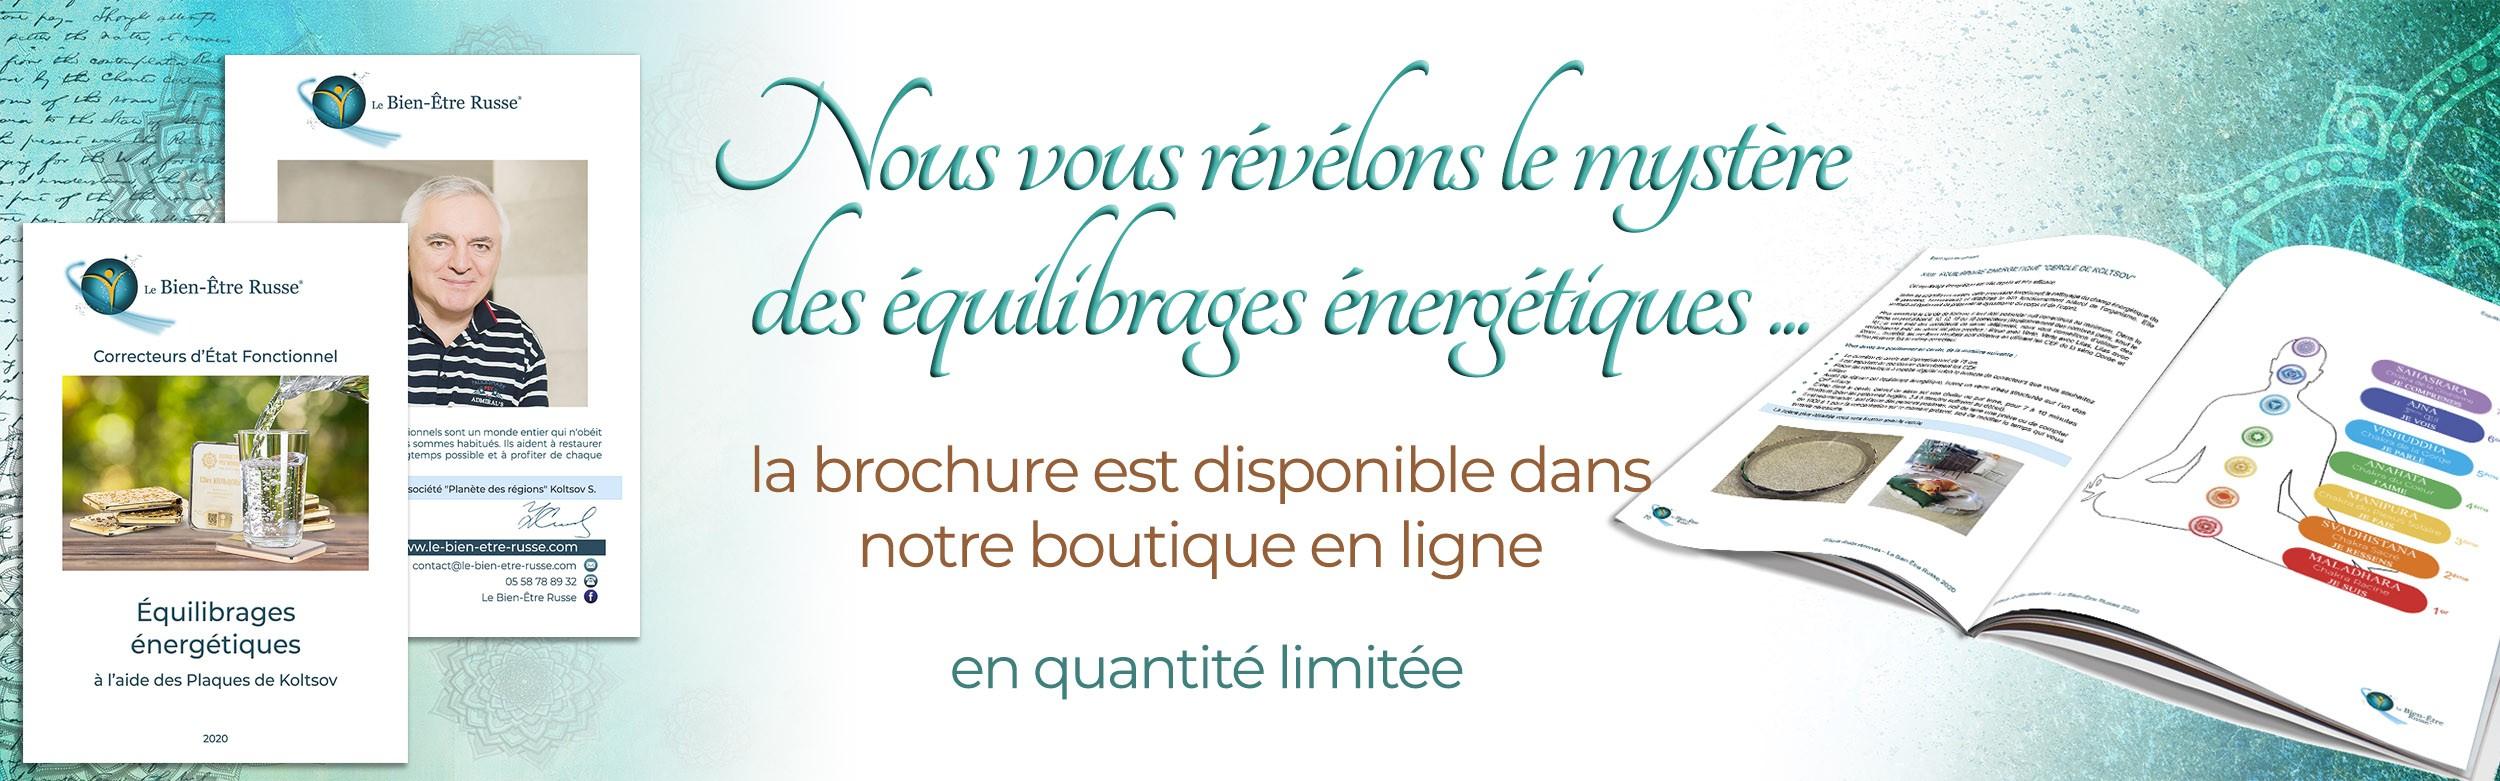 Brochure Equilibrage énergétique